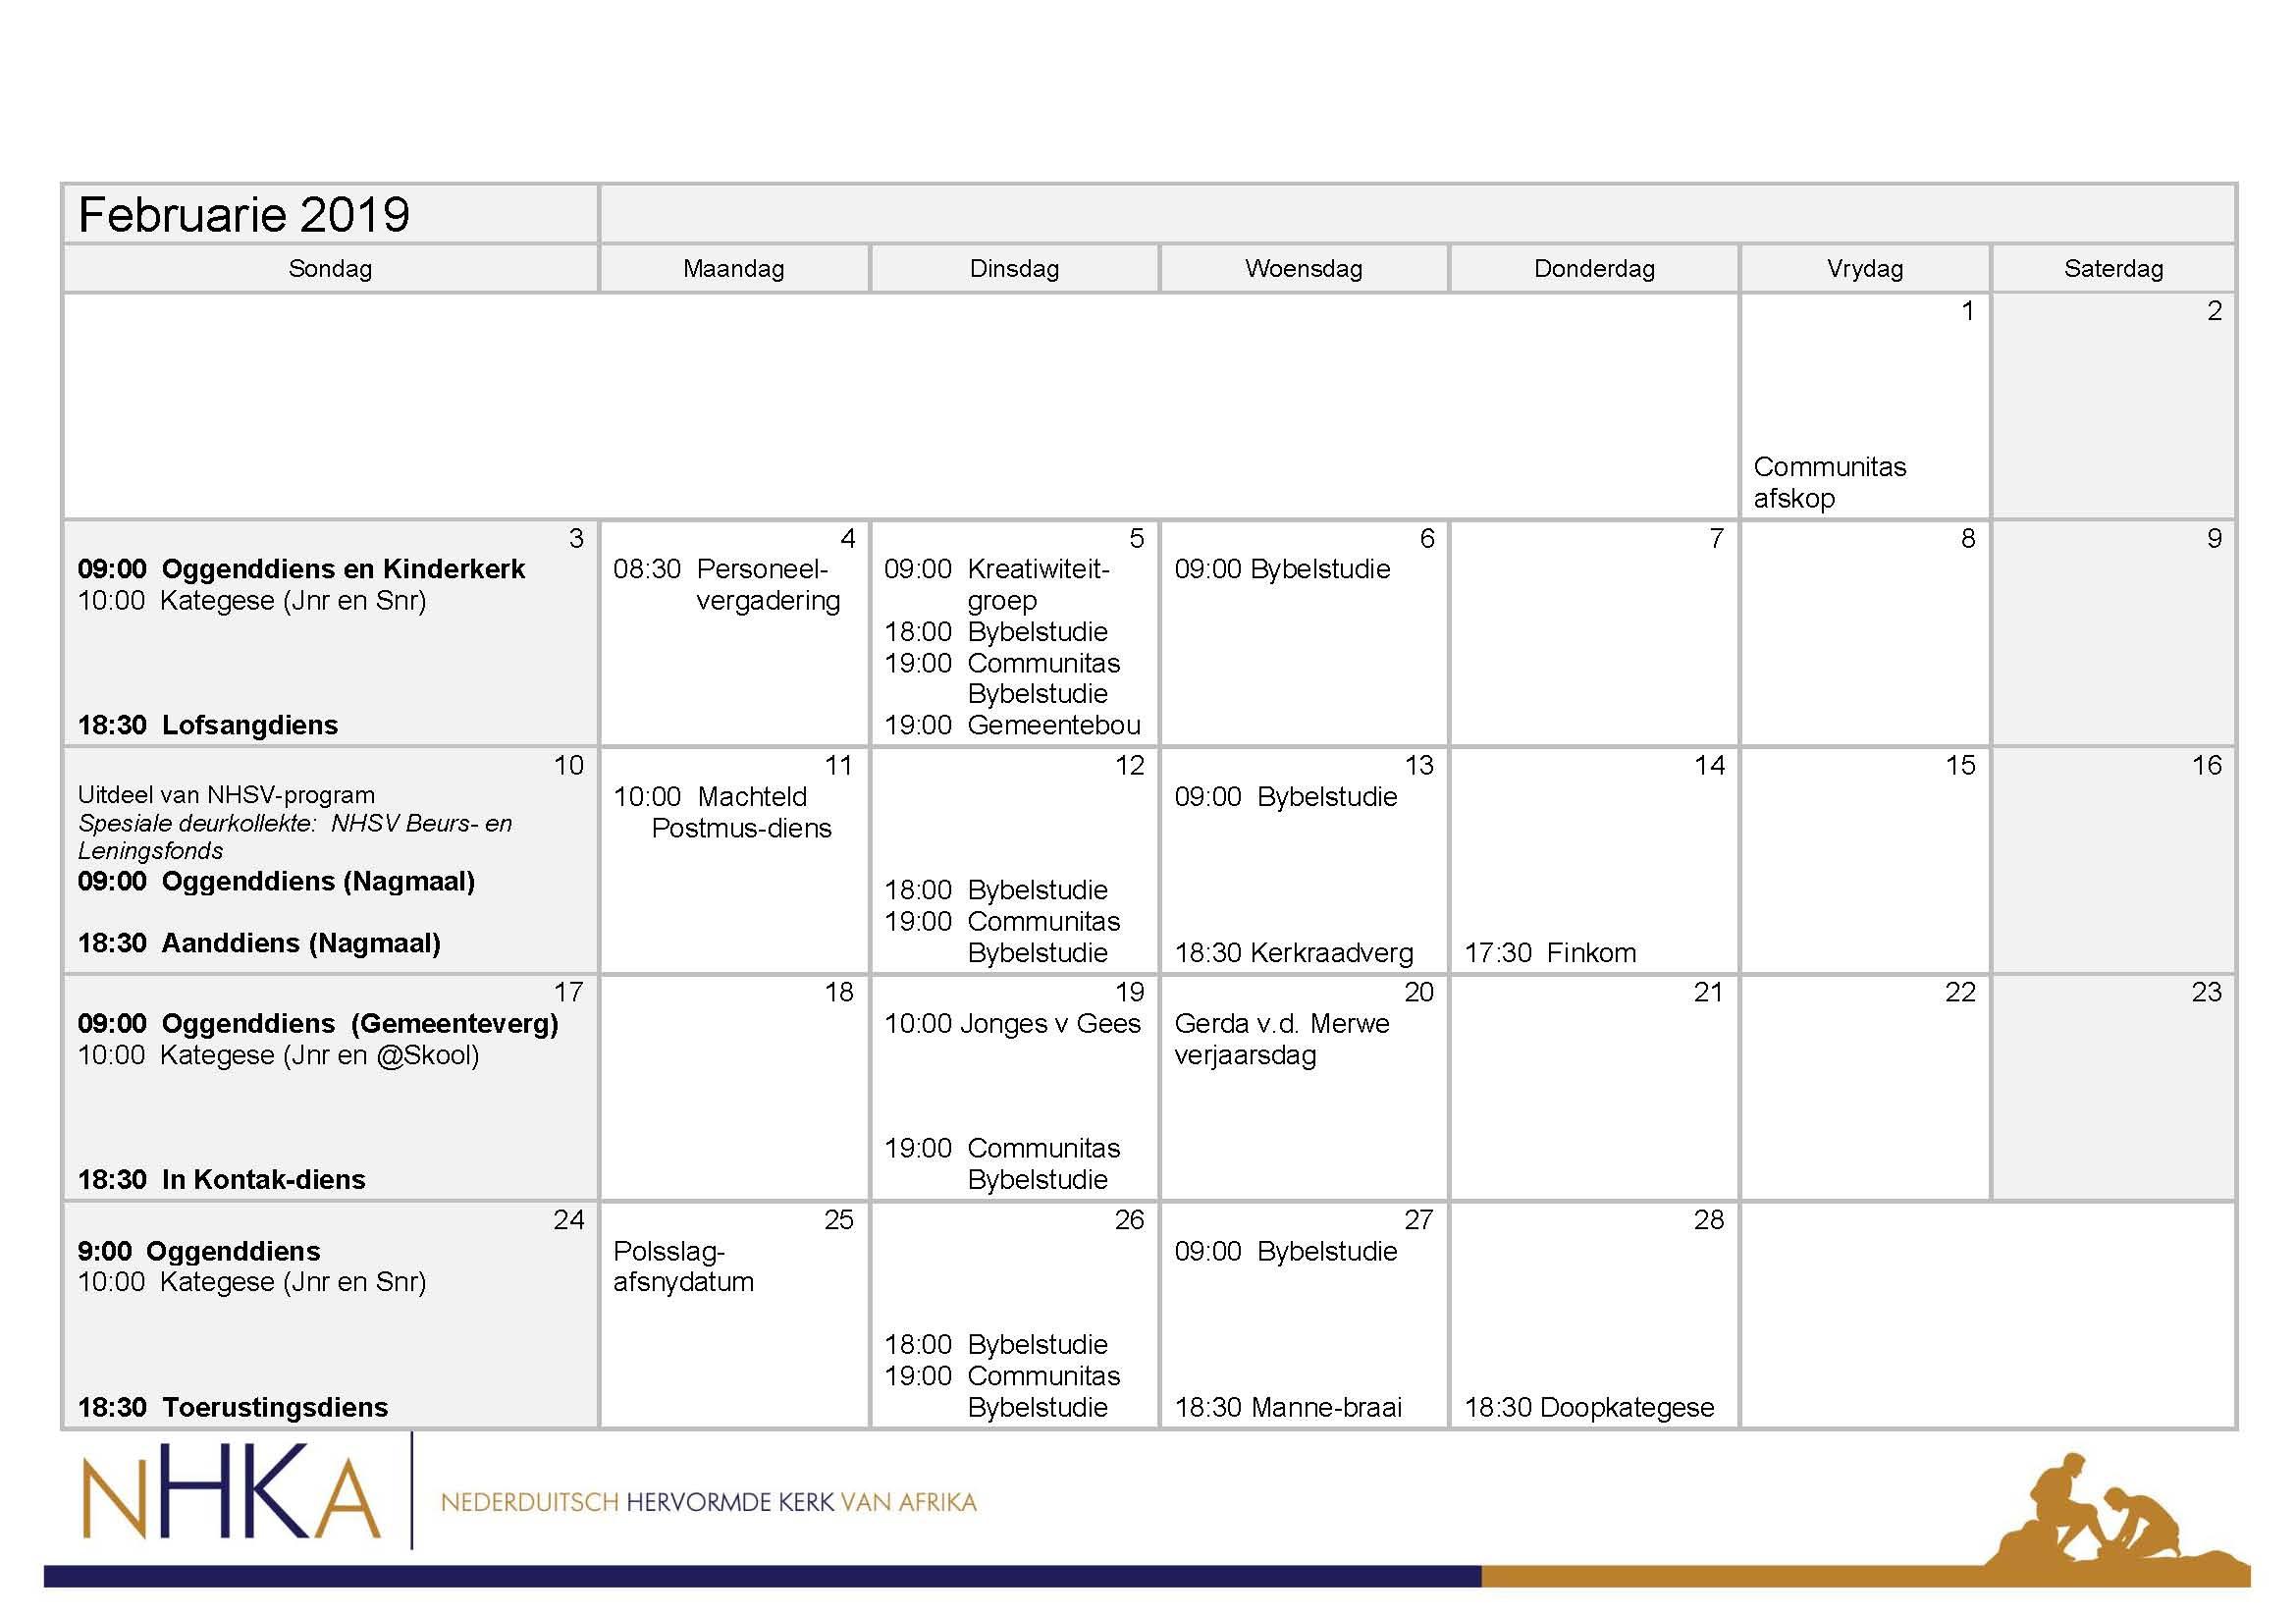 nhka 2019 Pretoria-Oos kalender_Page_02.jpg